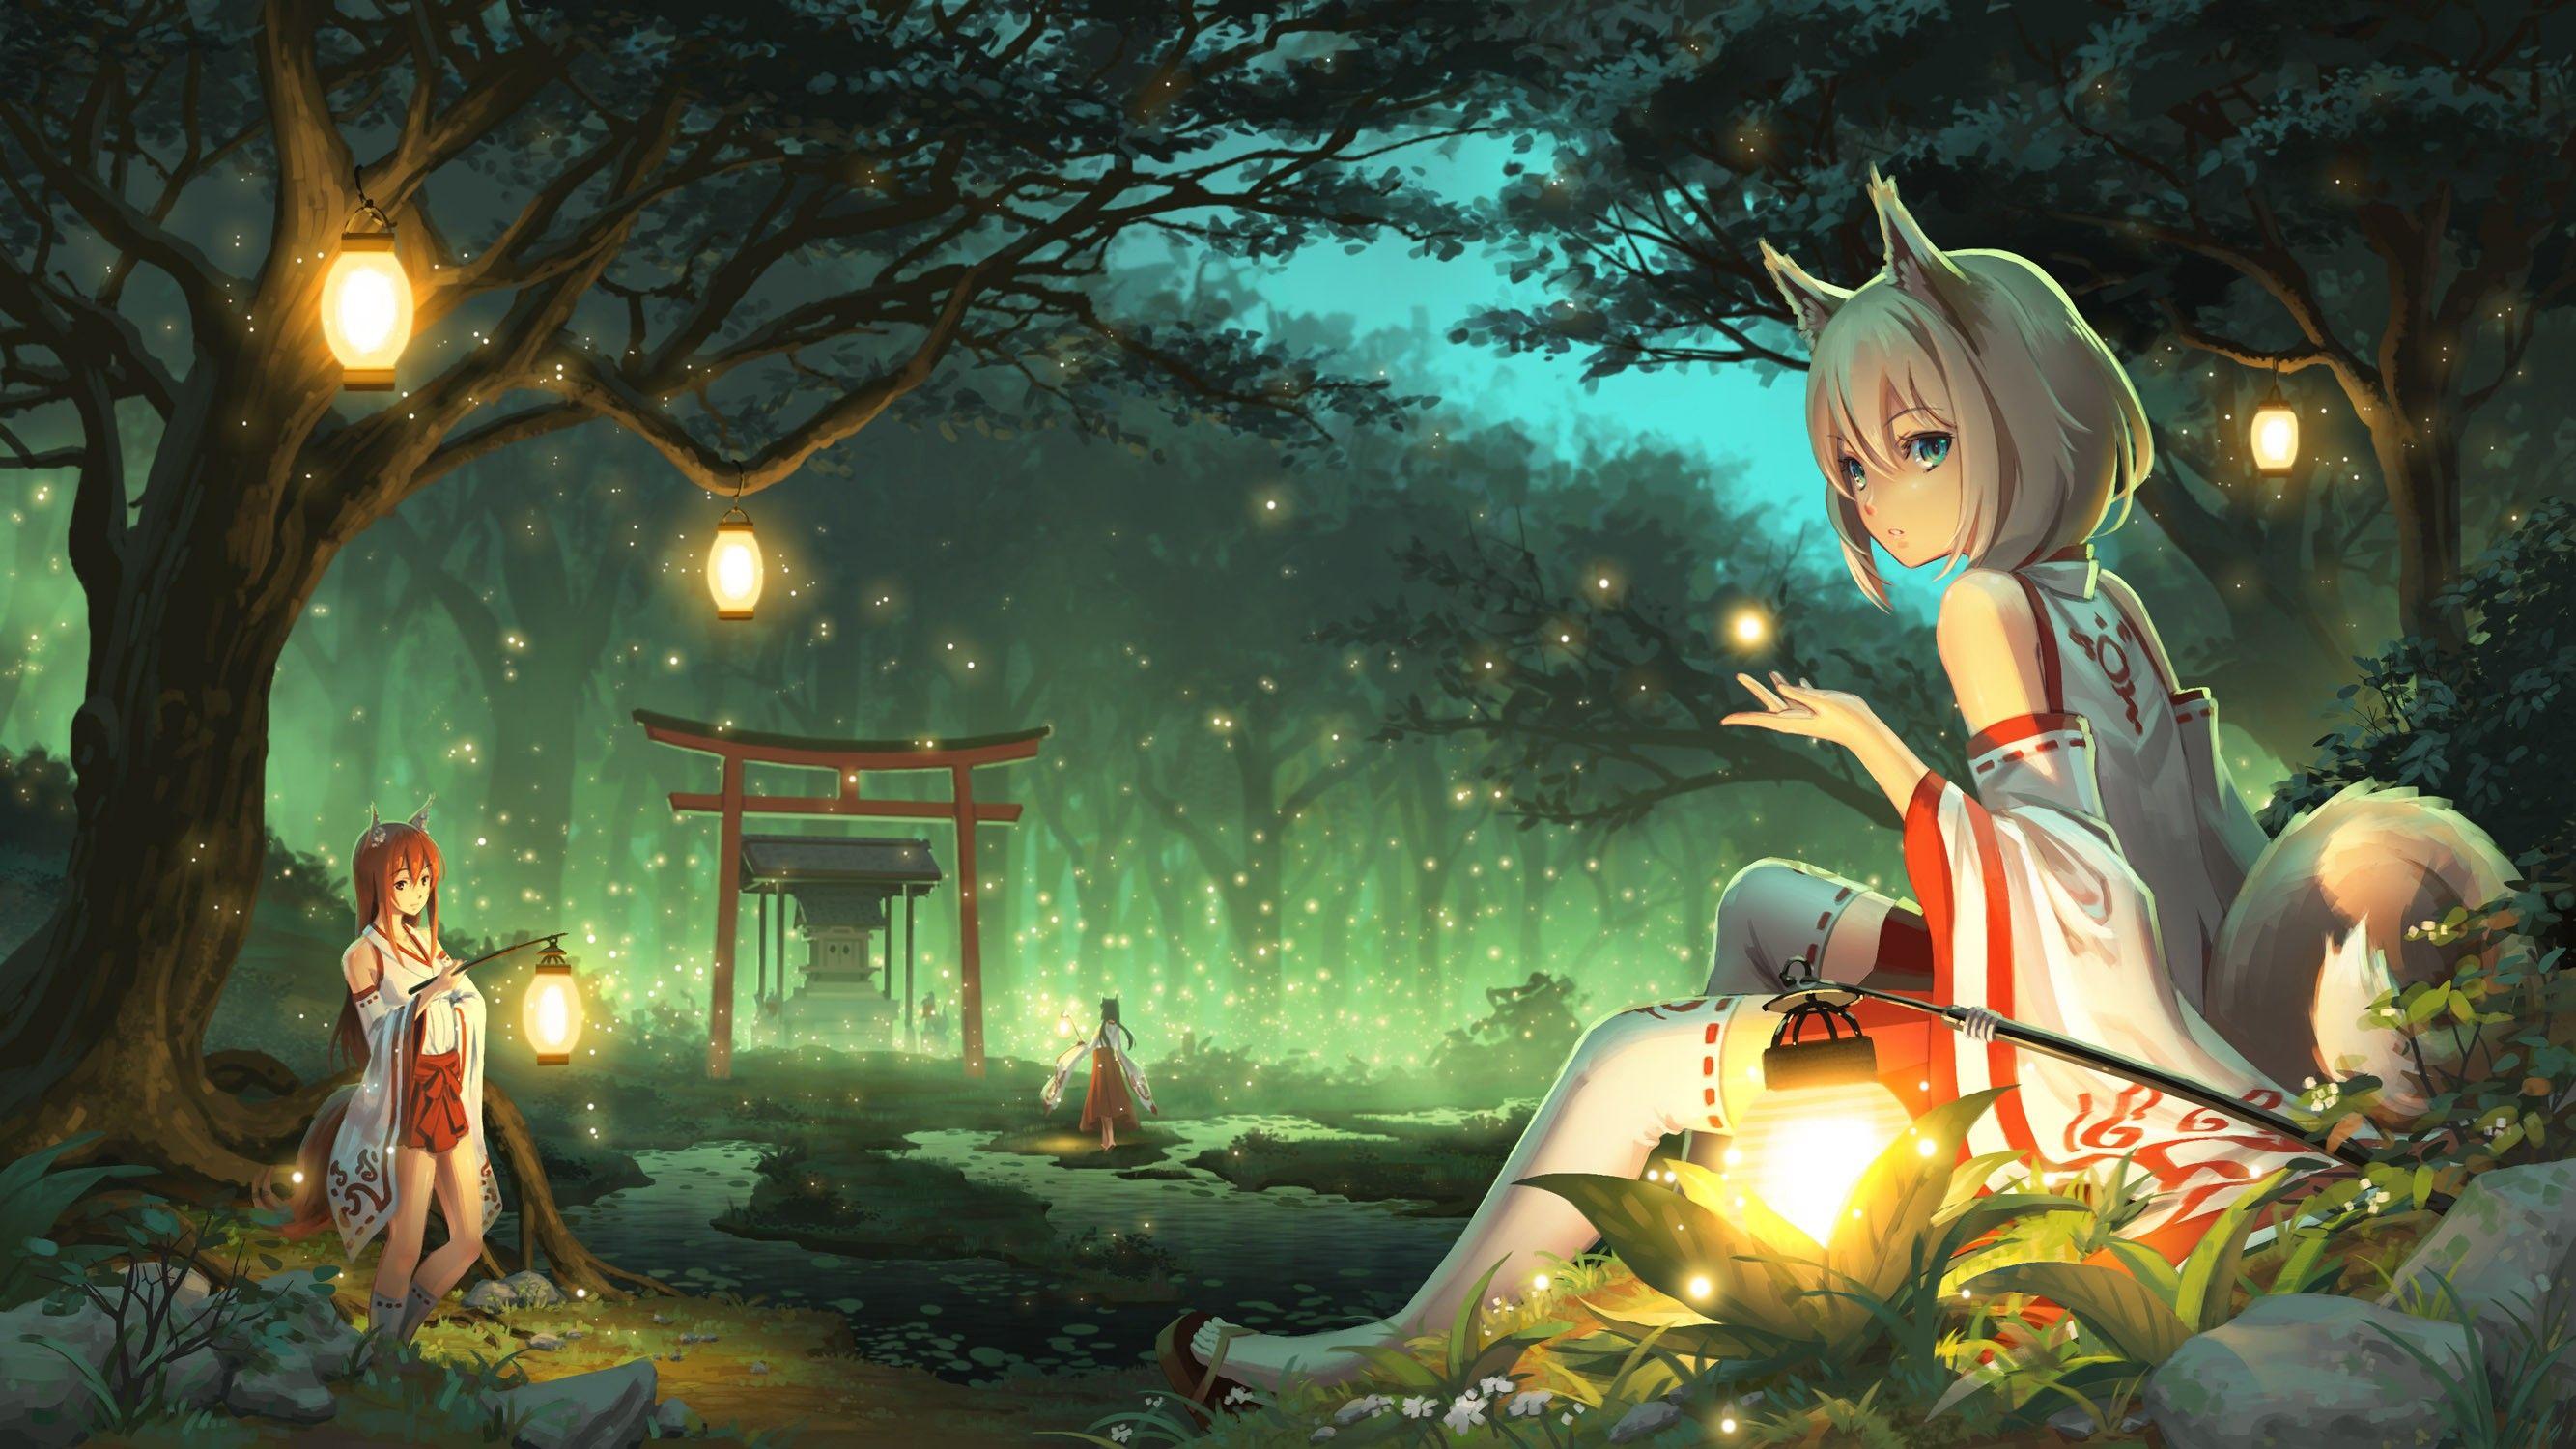 Anime Wallpaper 2667x1500 anime girls animal ears